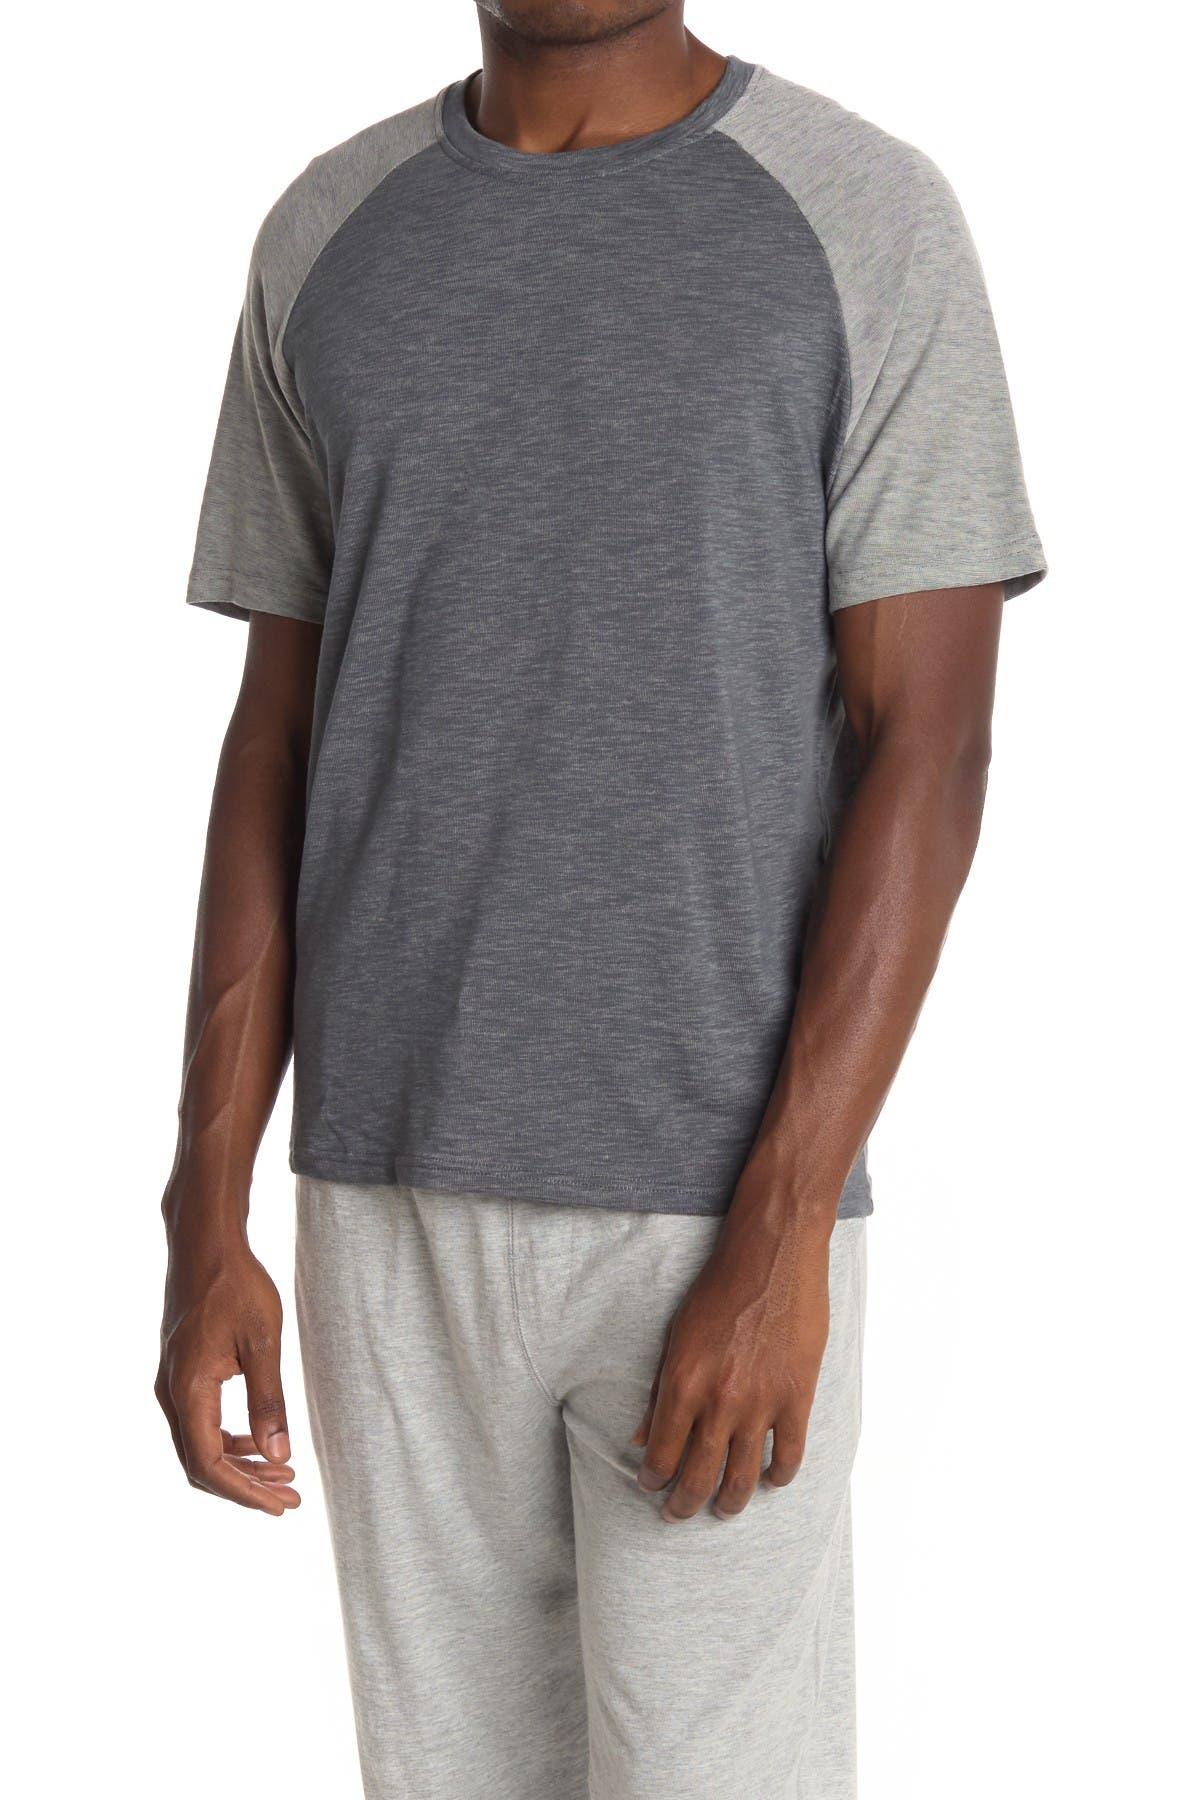 Image of Joe's Jeans Slub Knit Colorblock Raglan T-Shirt